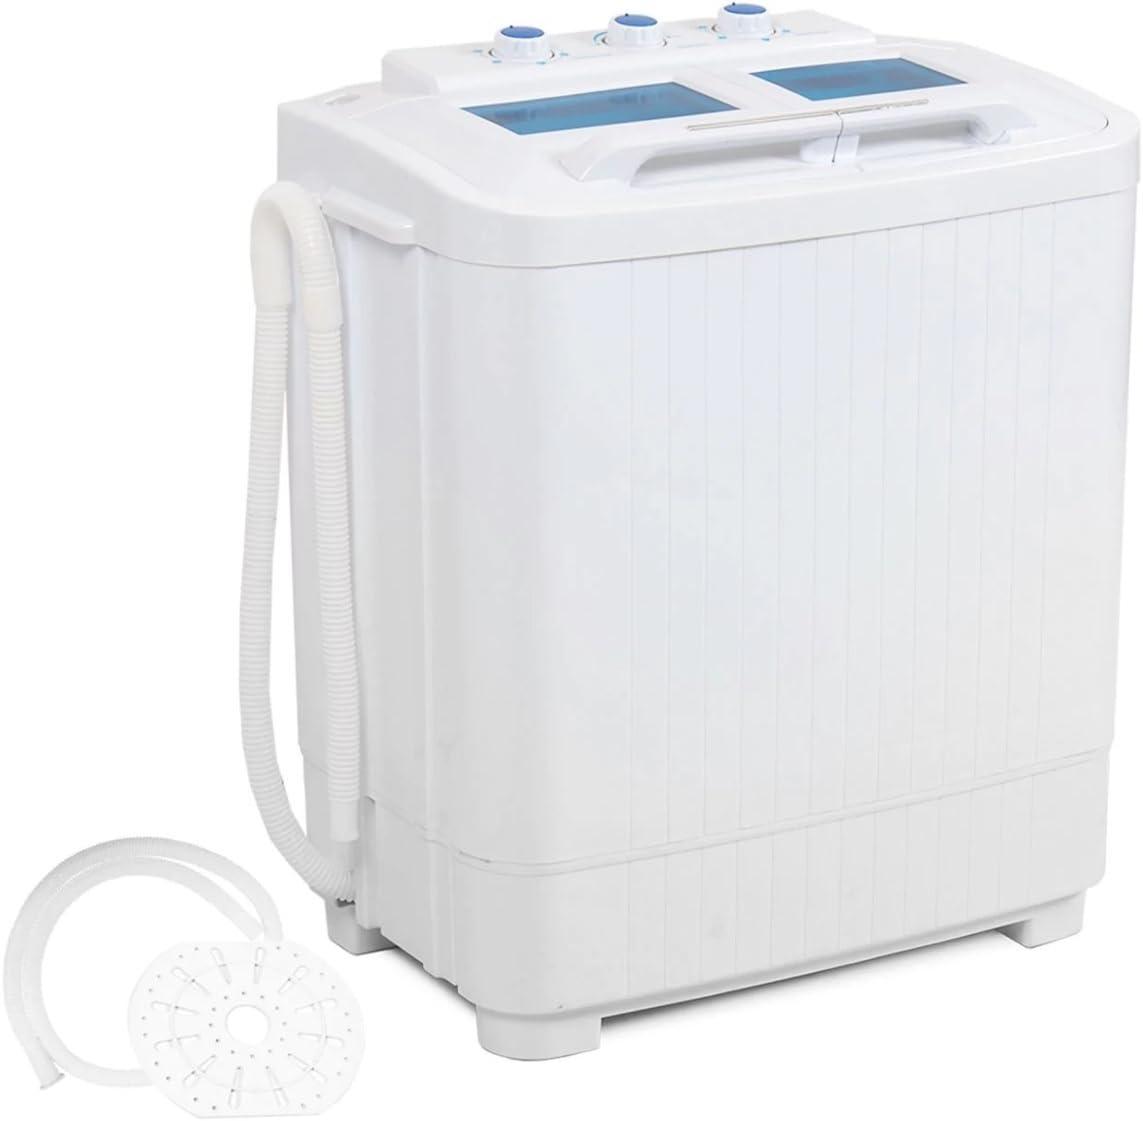 Mini lavadora portátil Sma lavadora RV Dorms Mac Compact Easy ll ...